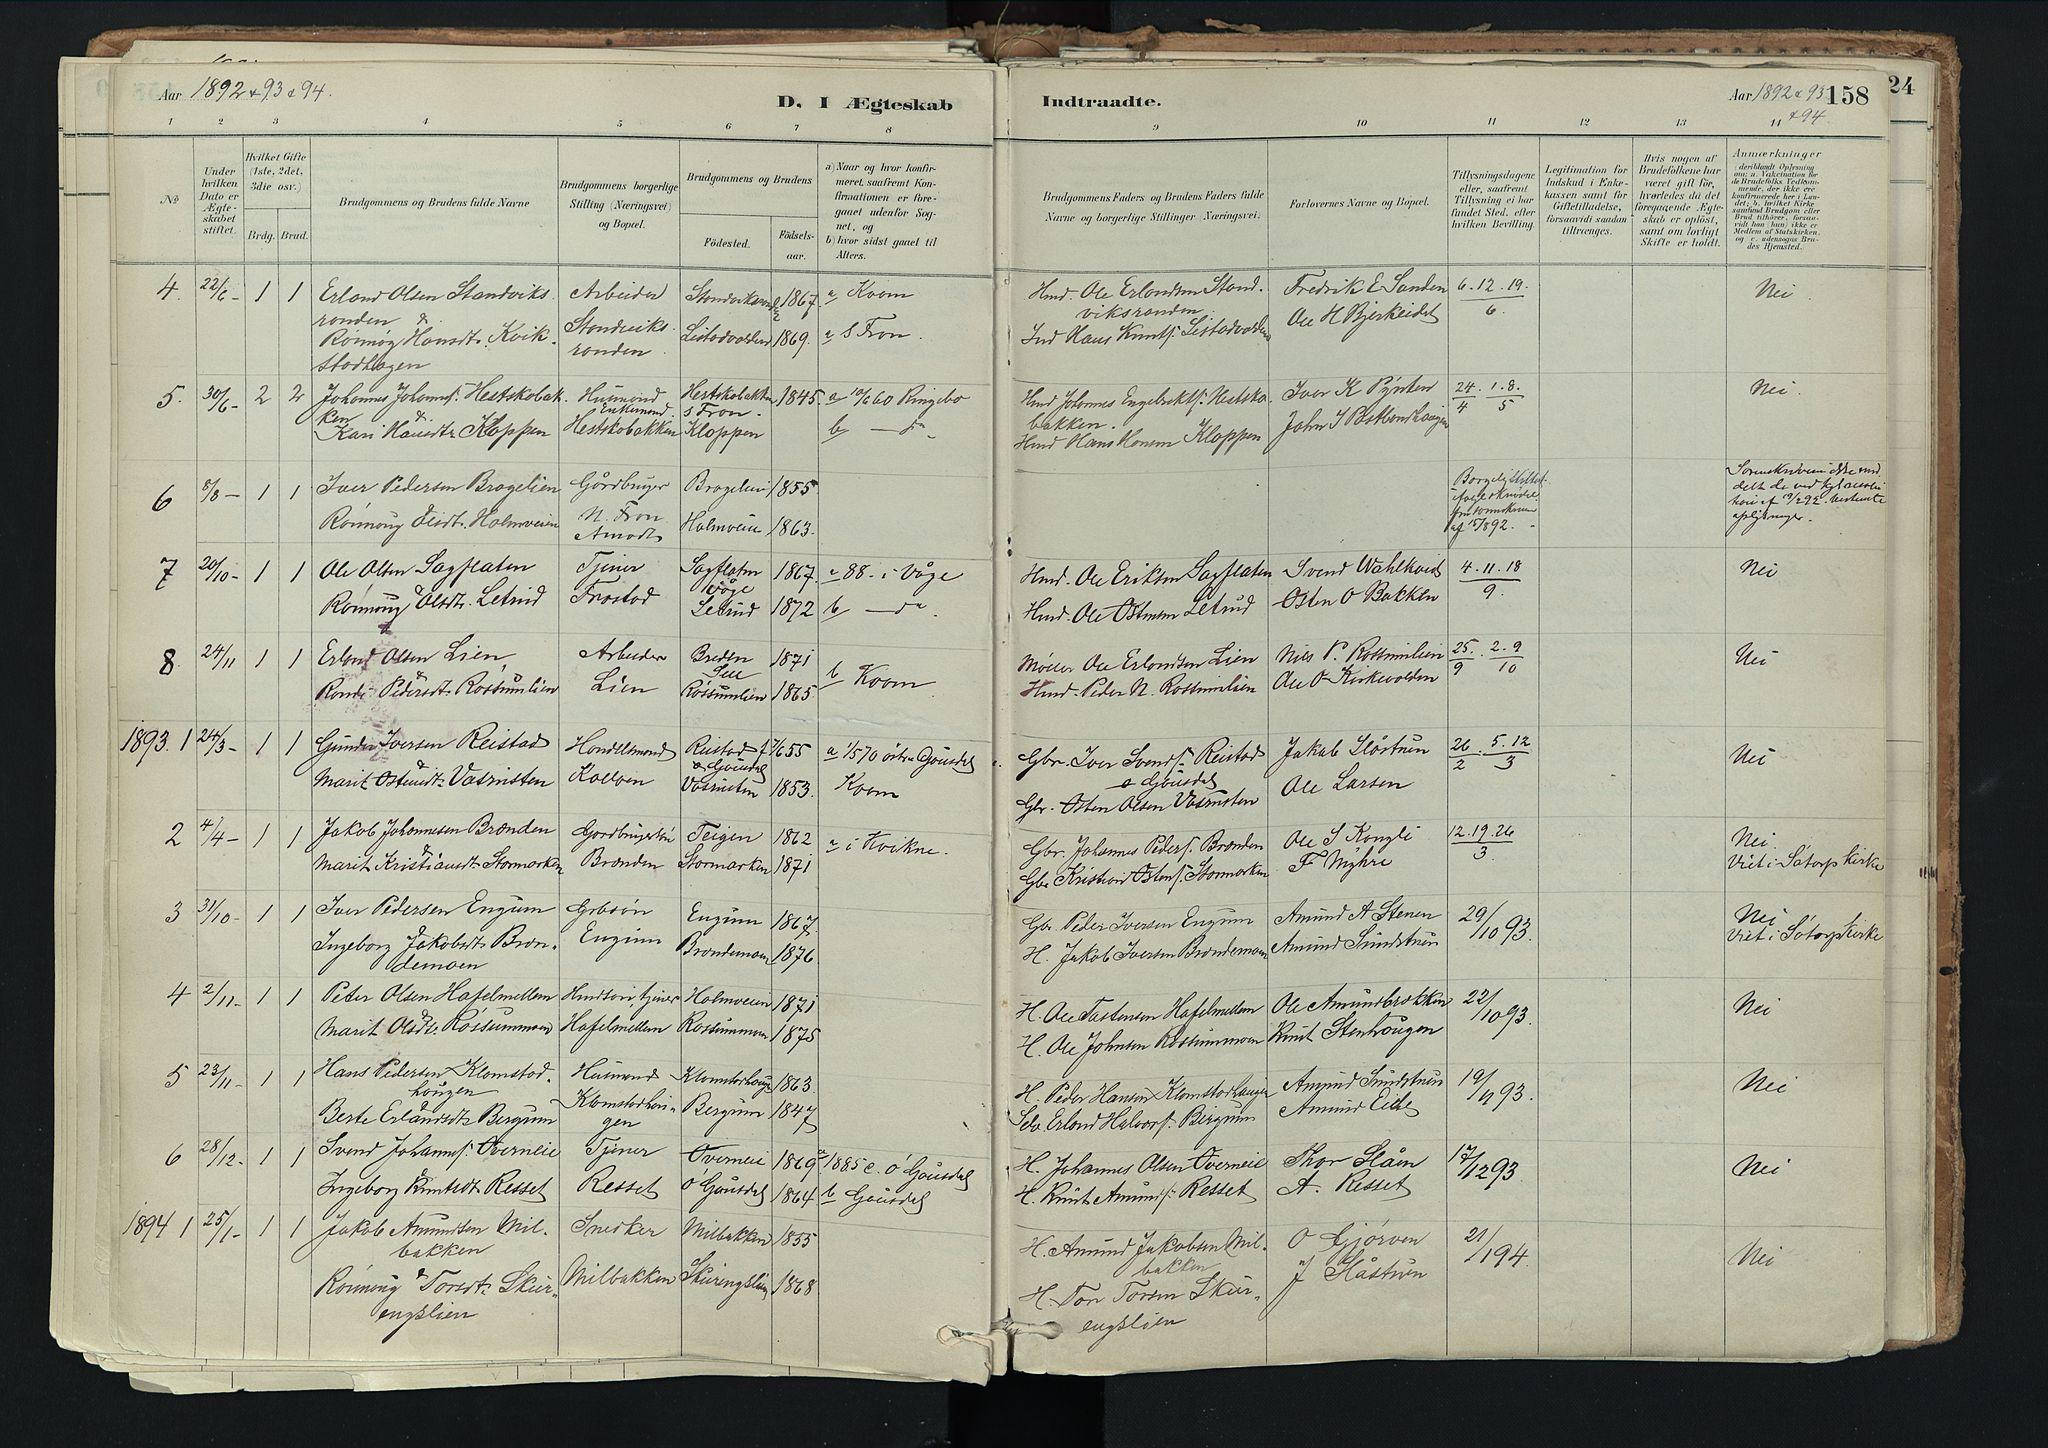 SAH, Nord-Fron prestekontor, Ministerialbok nr. 3, 1884-1914, s. 158